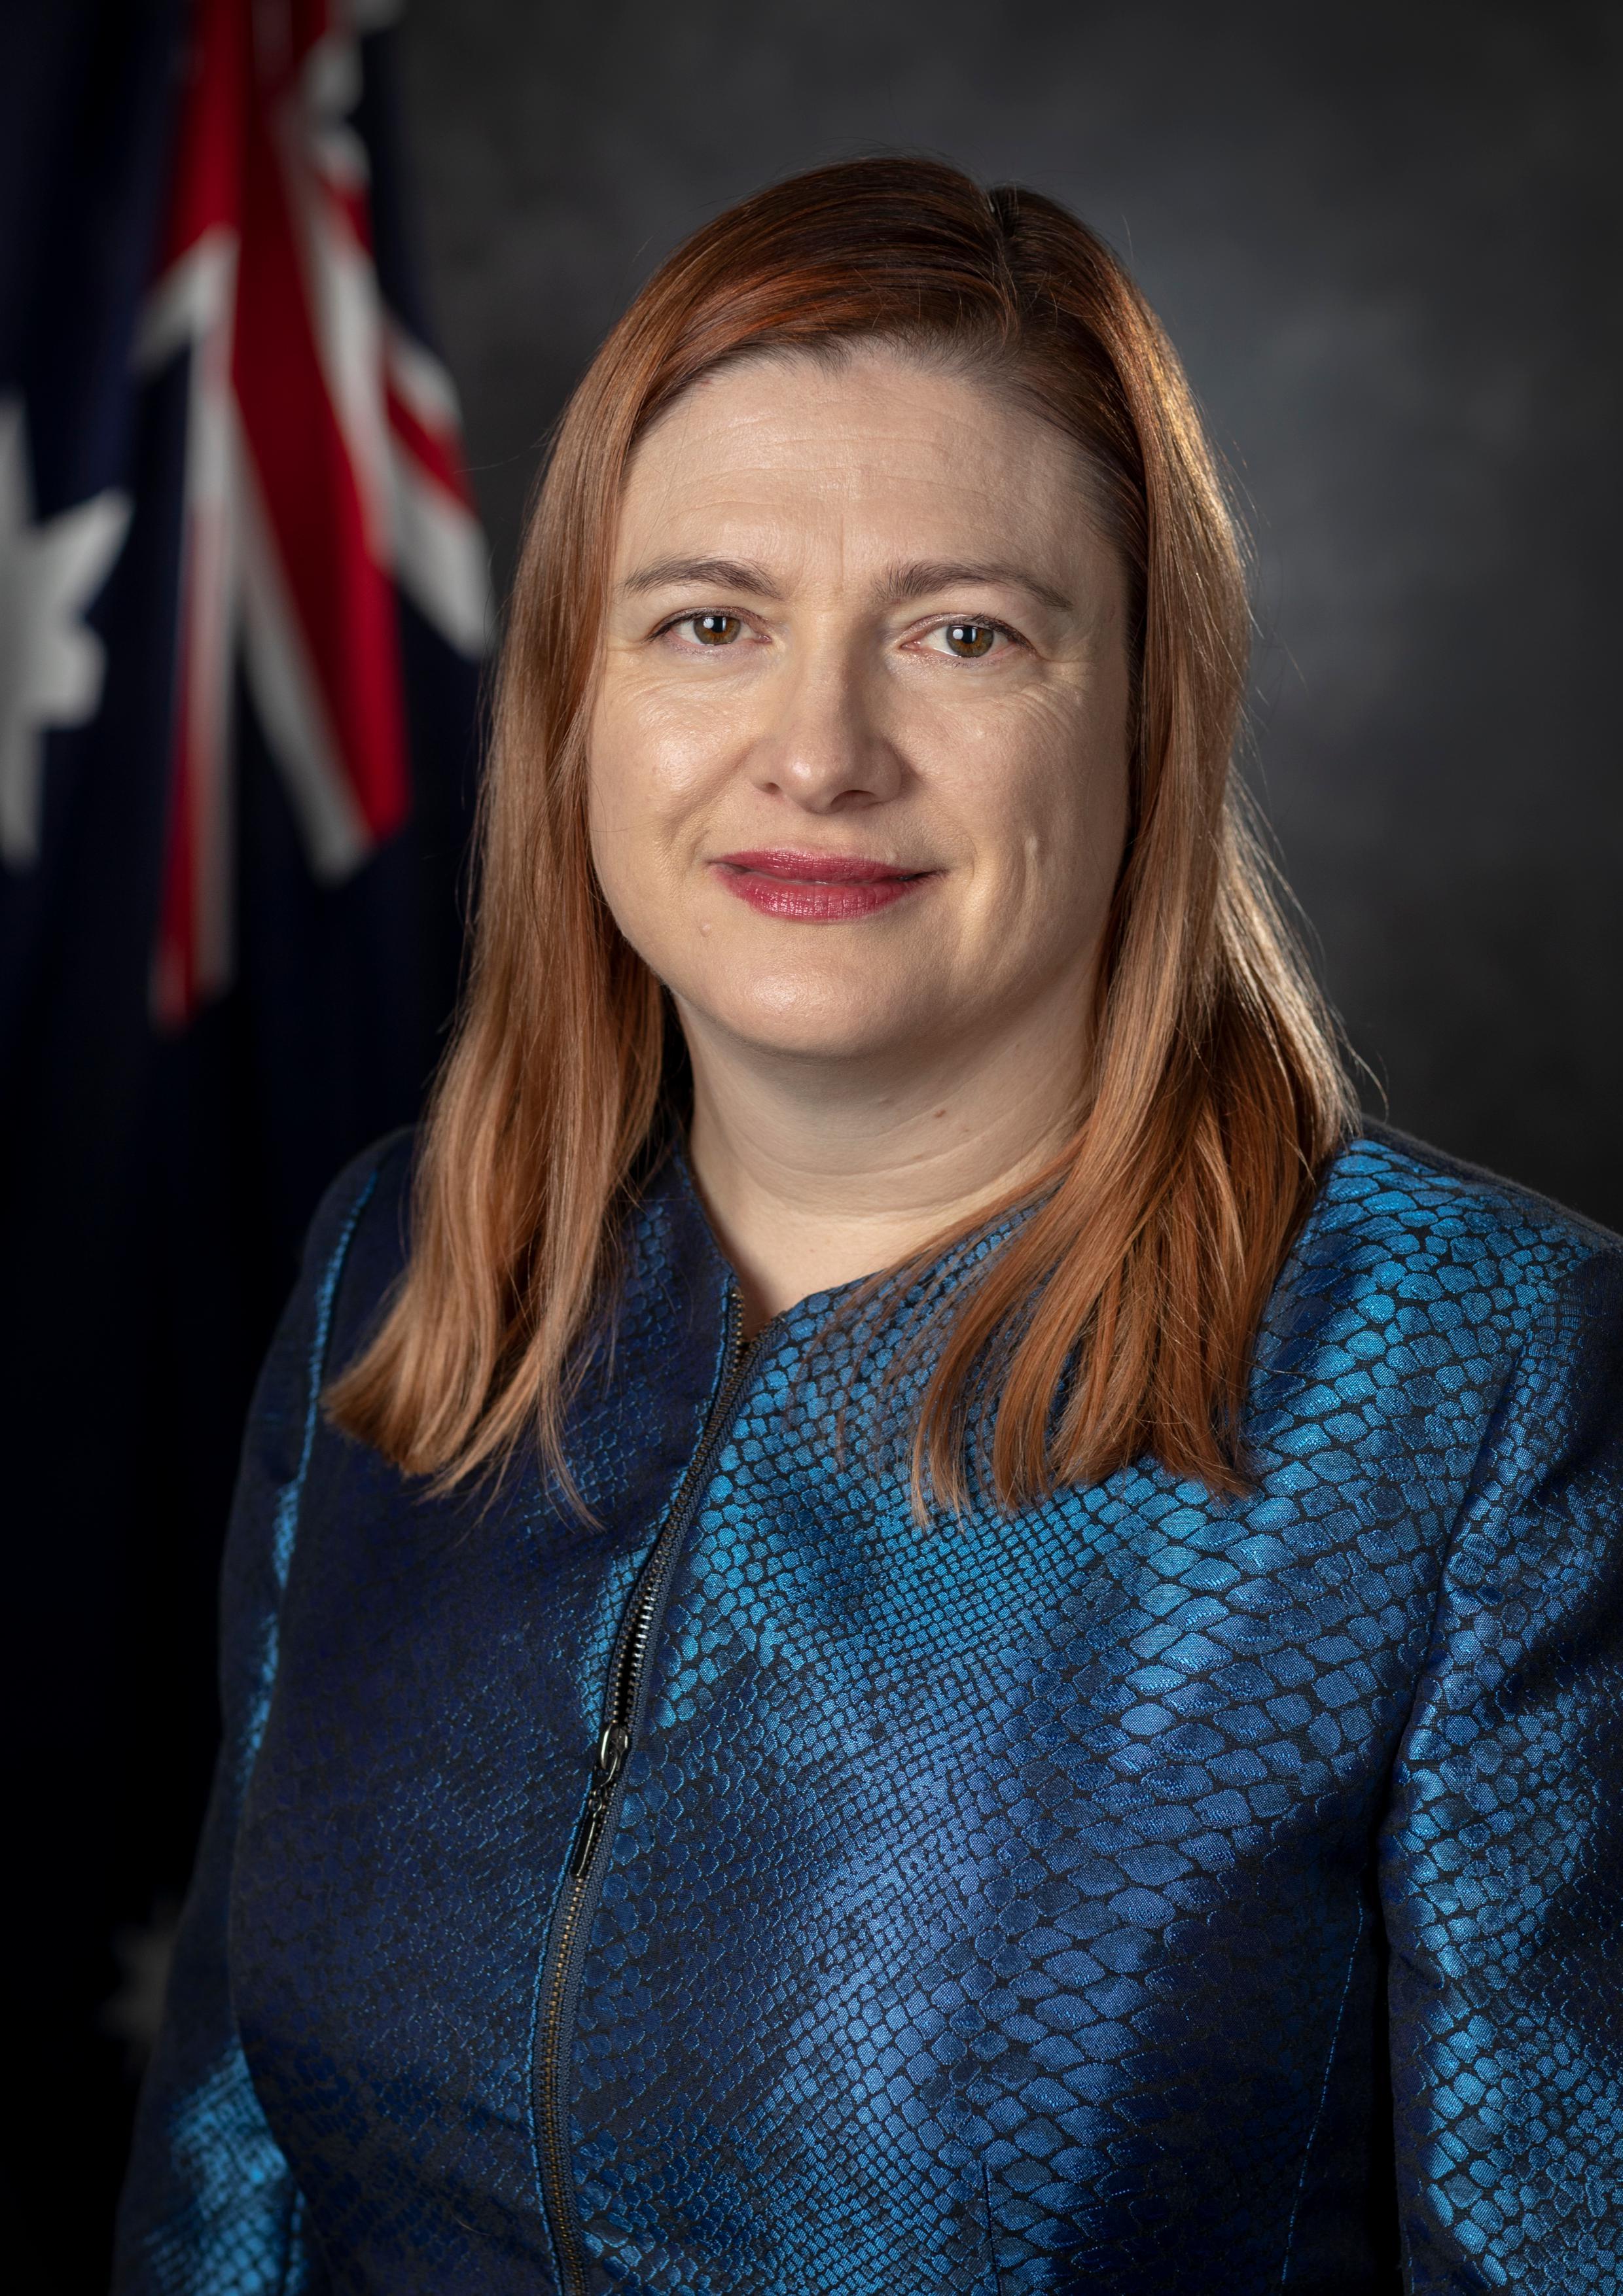 Tanya Monro